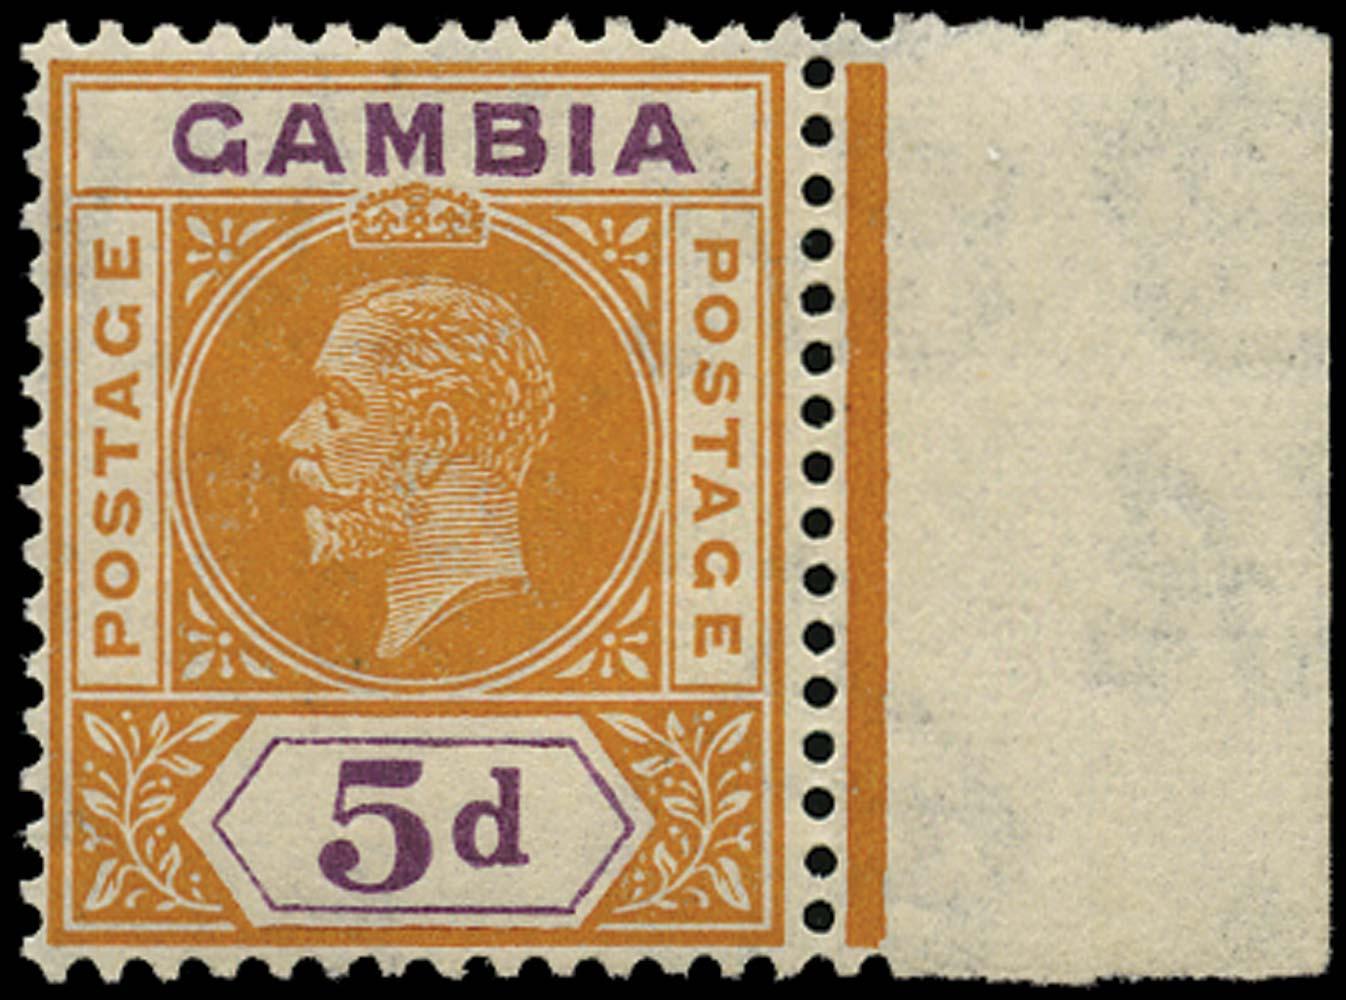 GAMBIA 1921  SG113x Mint 5d purple and orange watermark reversed